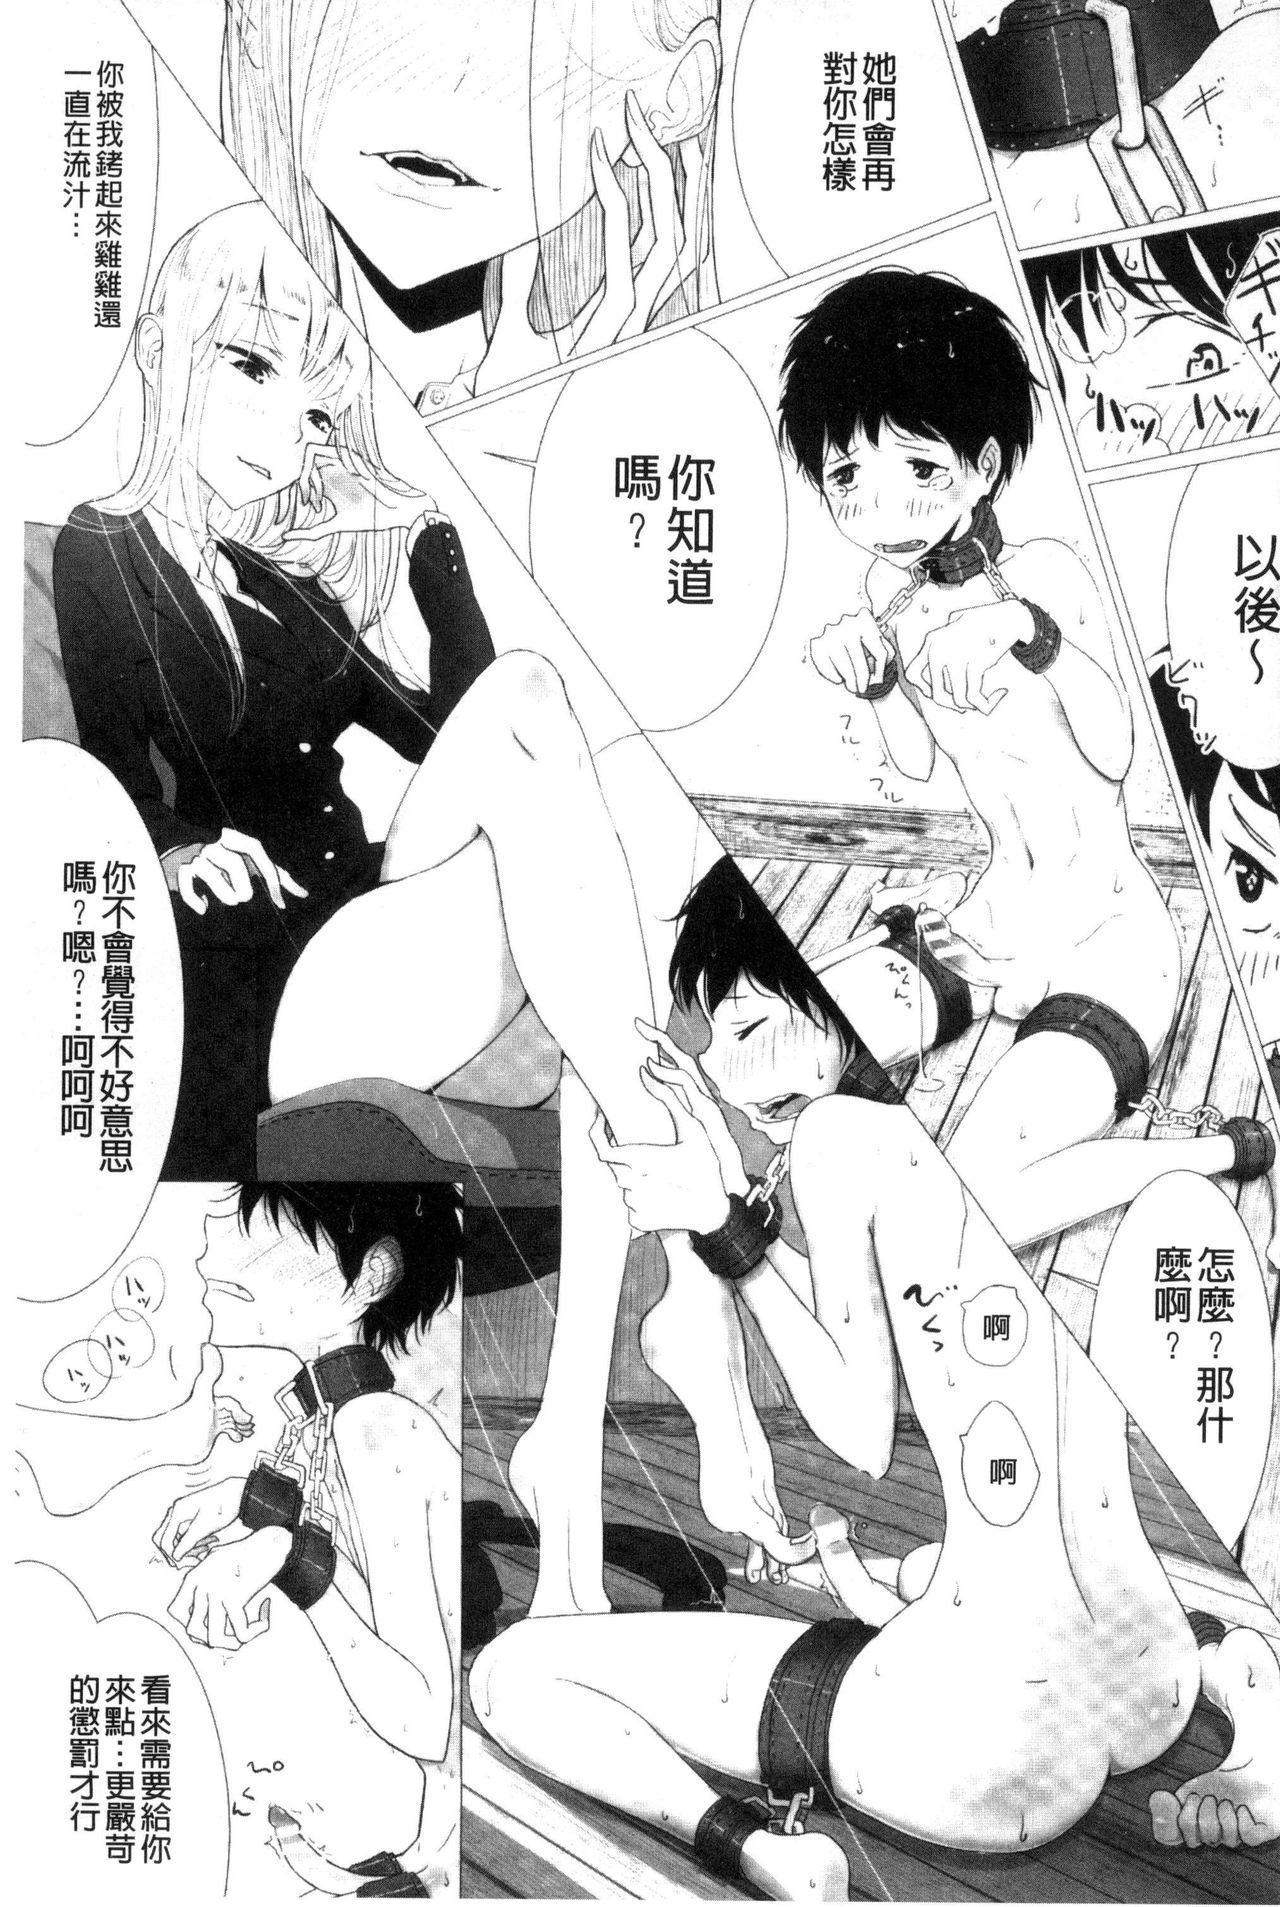 [Dhibi] Sono Yubisaki de Korogashite - Please Caress it at the Finger-tip. [Chinese] 170